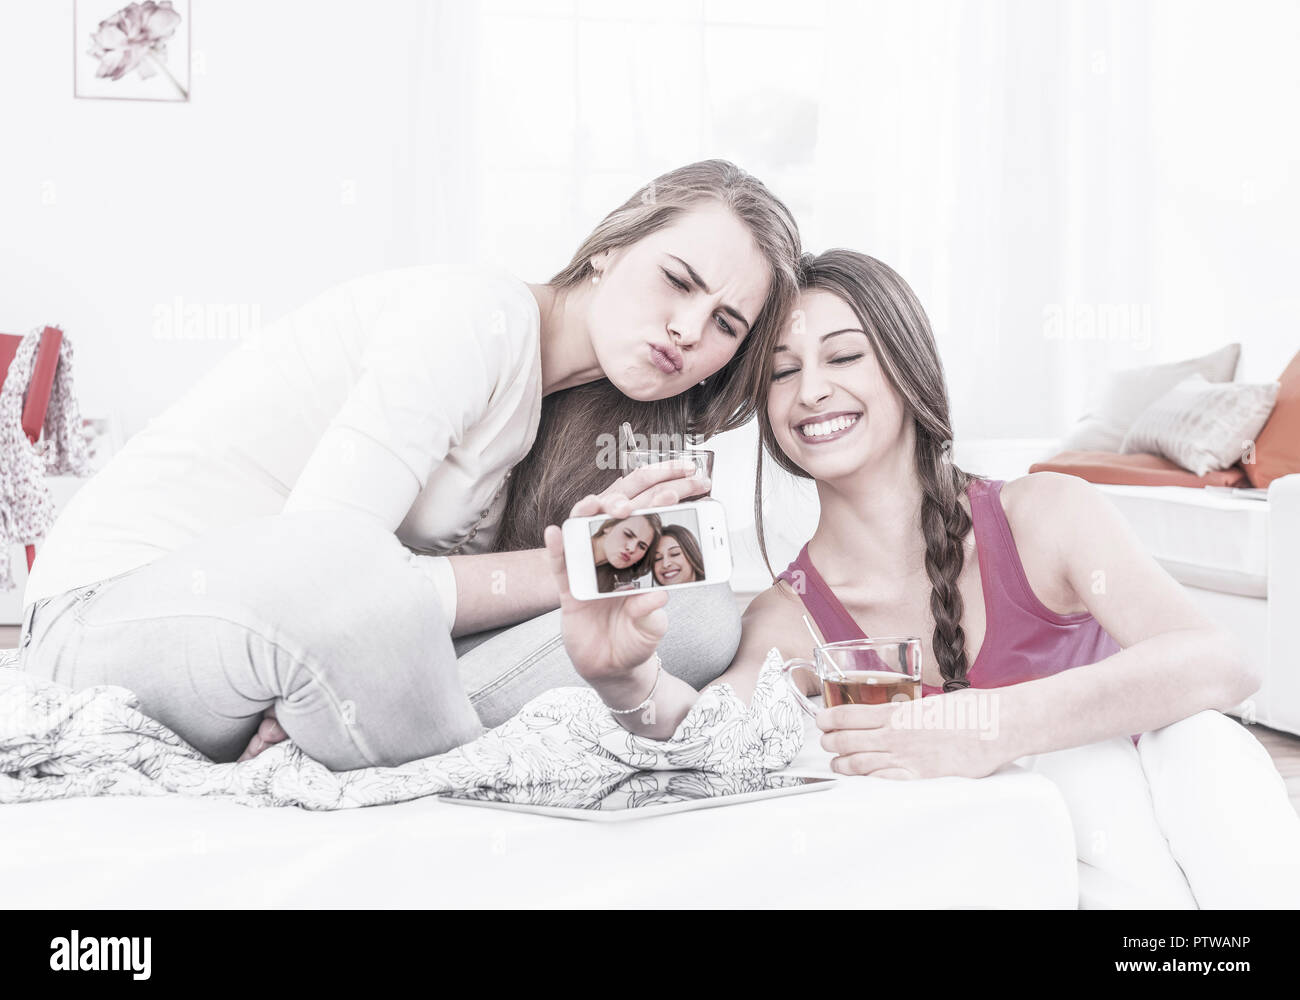 Zwei Maedchen fotografieren sich mit Smartphone (model-released) - Stock Image